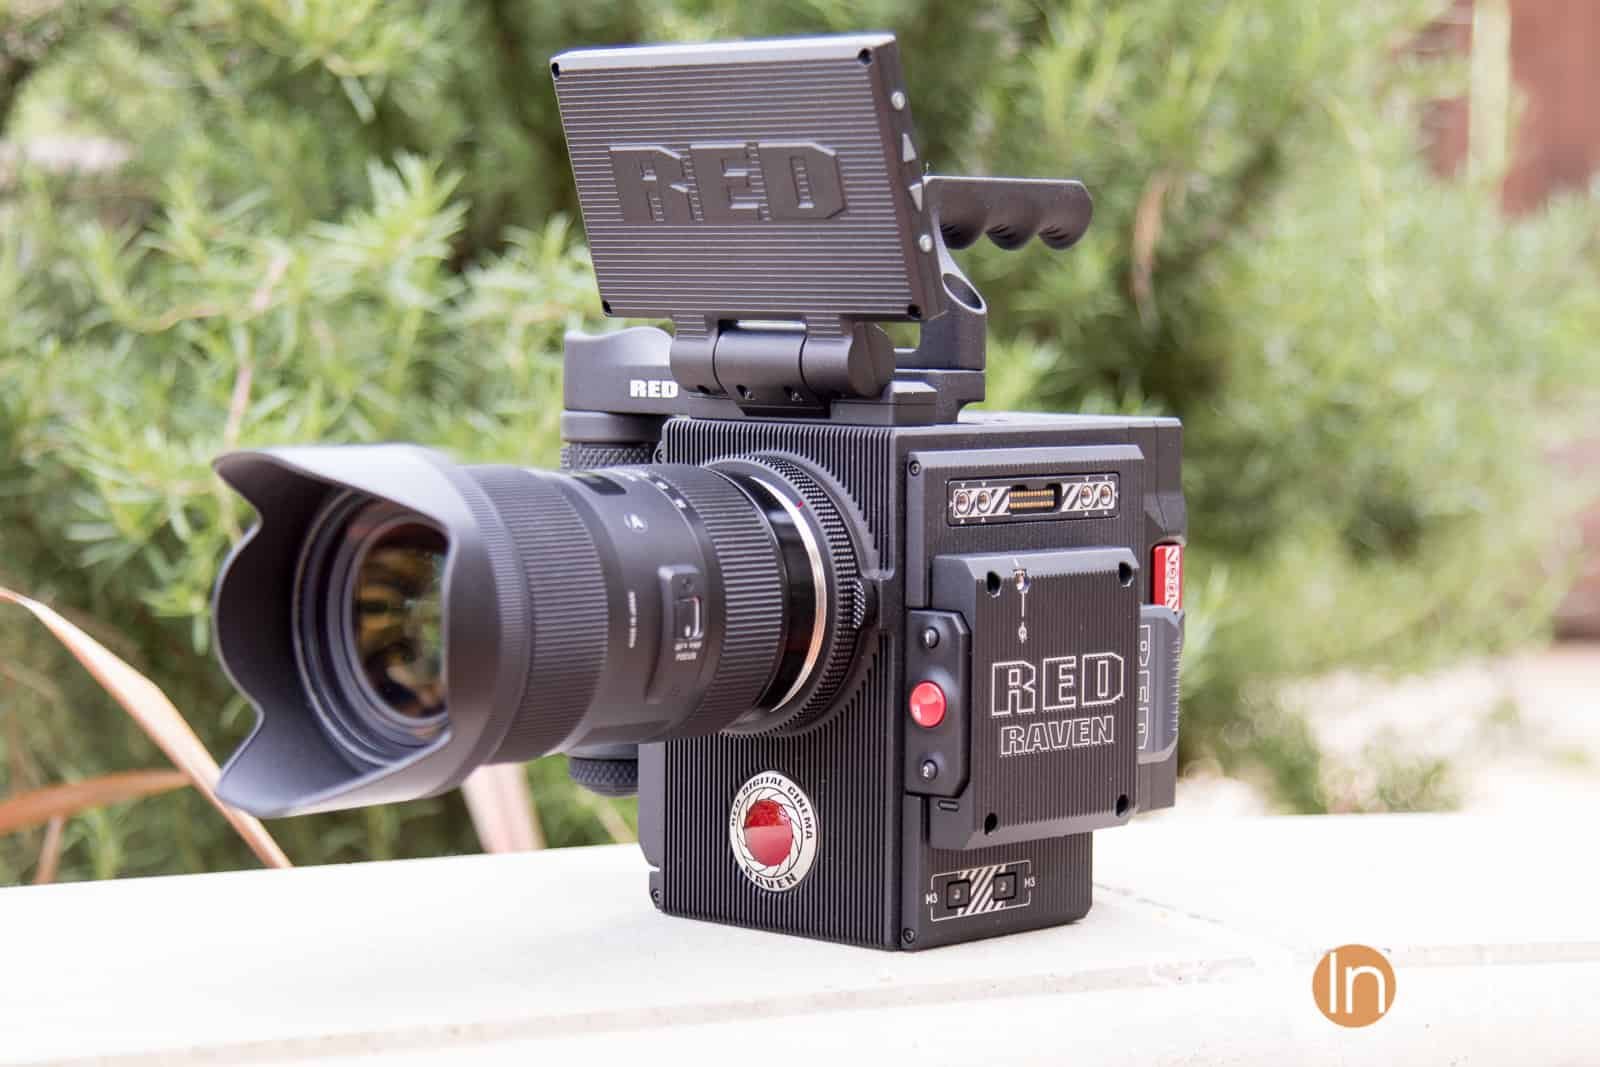 RED-Raven-Camera-Unboxing-Stark-Insider-8740